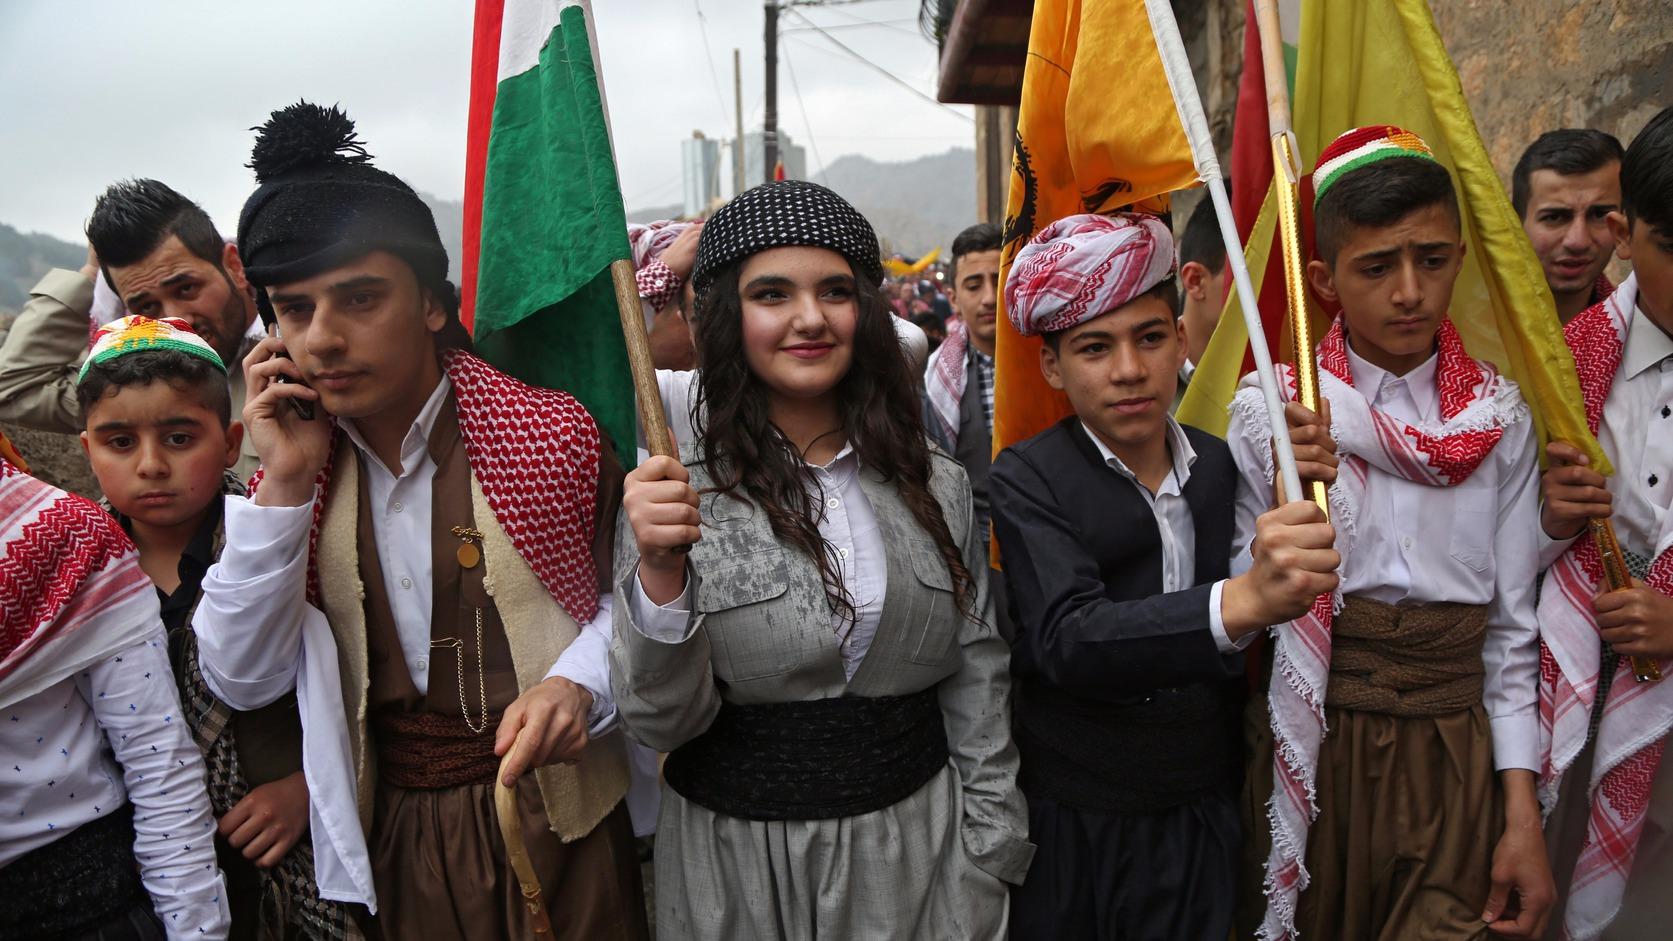 A kurd újévet ünneplik iraki kurdok. MTI/EPA Fotó